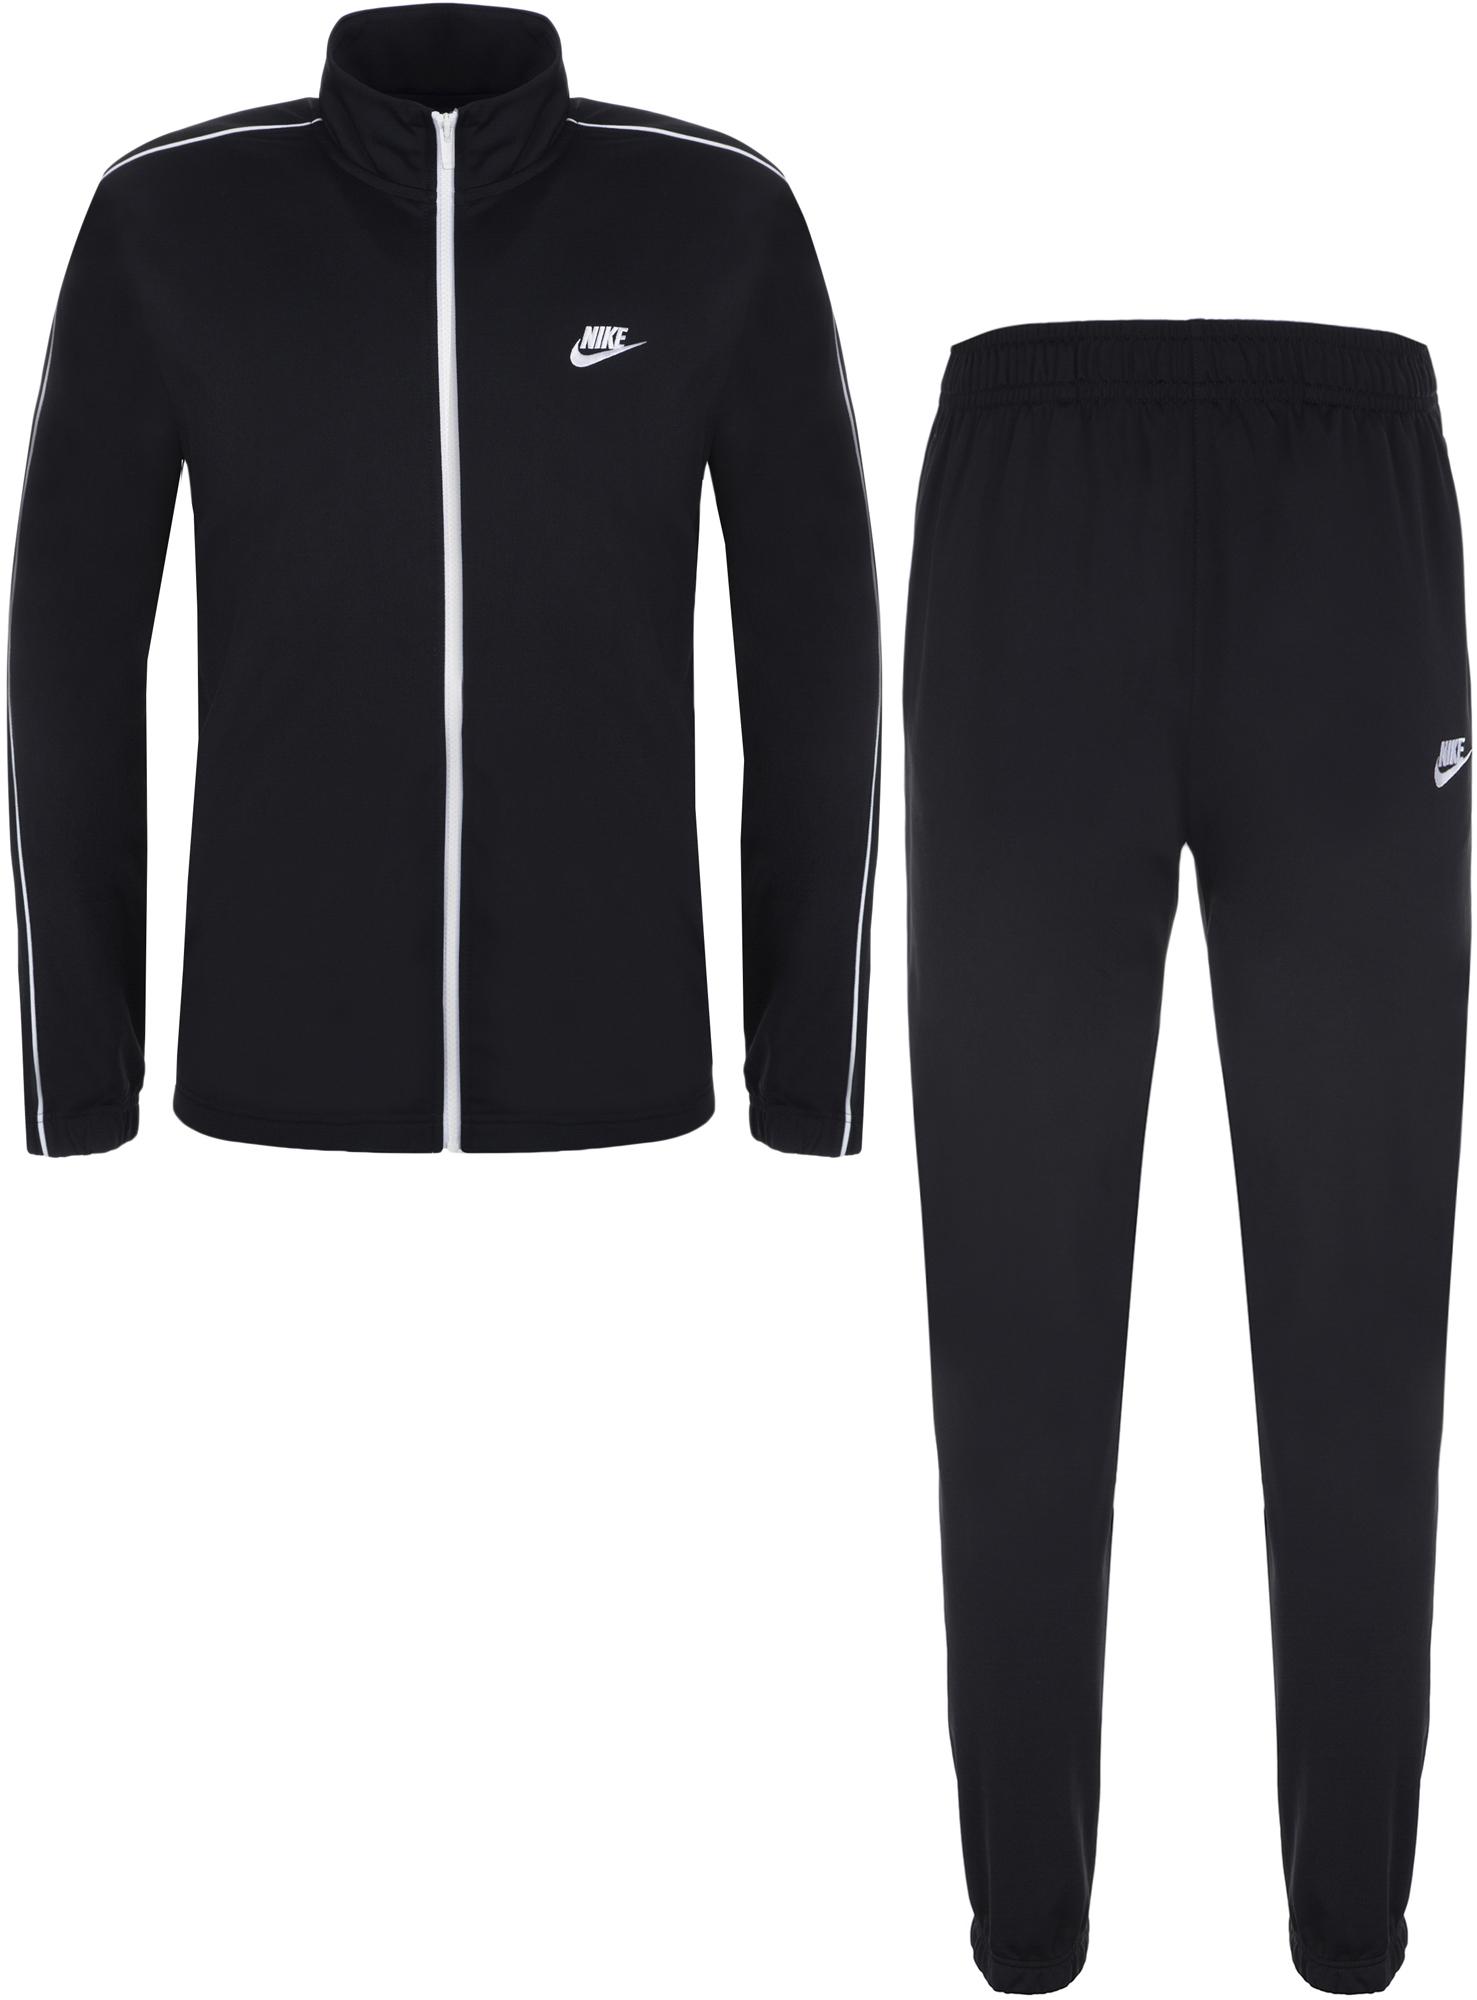 Nike Костюм мужской Nike Sportswear Basic, размер 52-54 цена